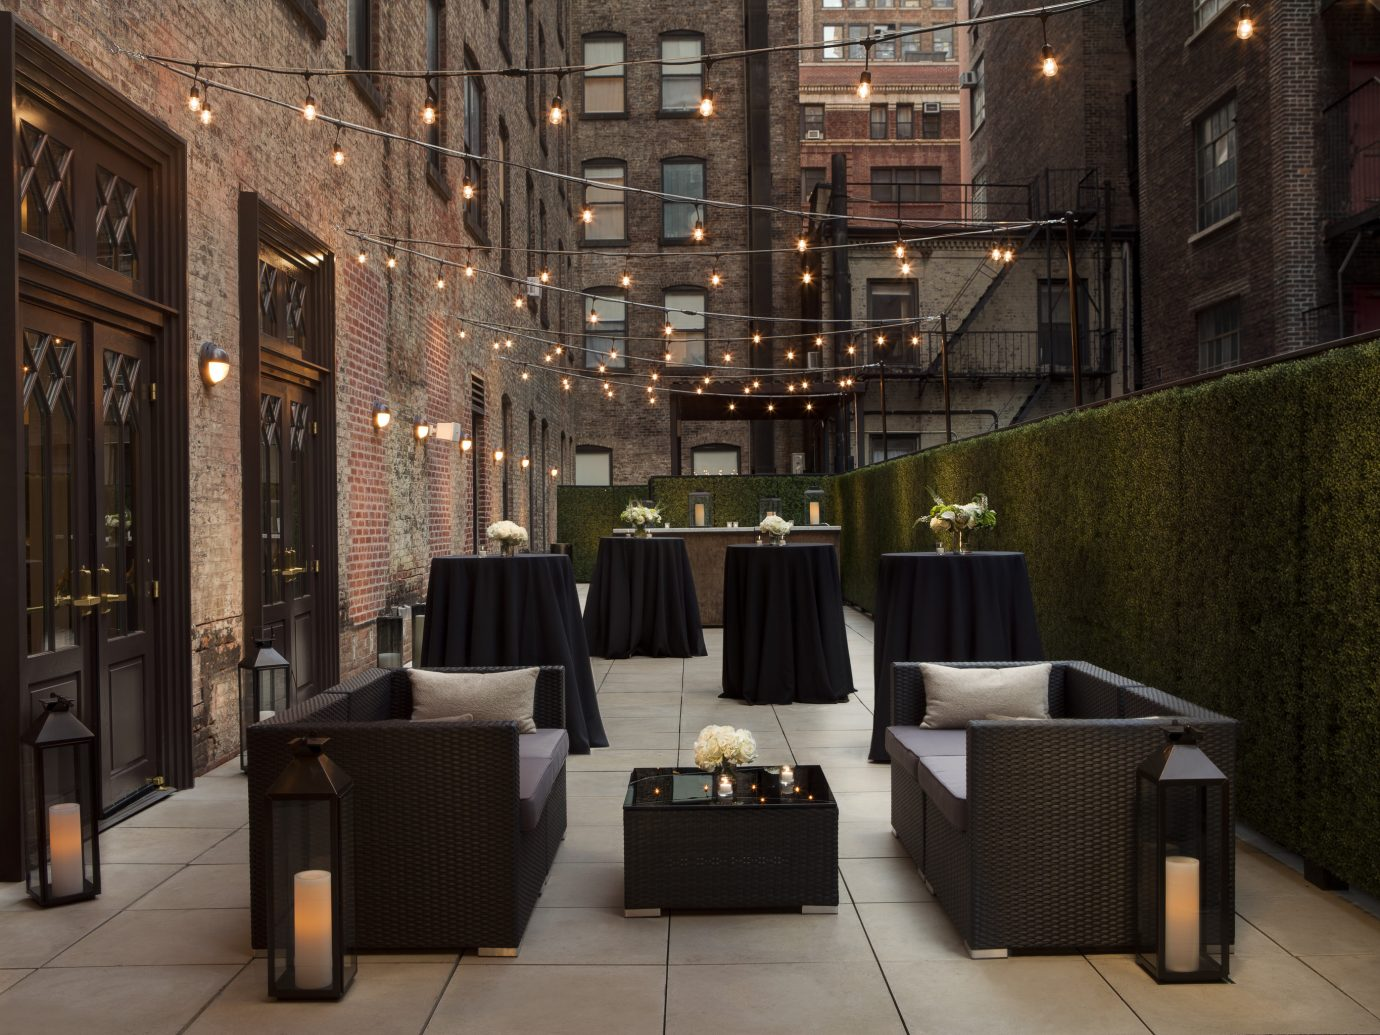 Outdoor patio at The Redbury, New York City